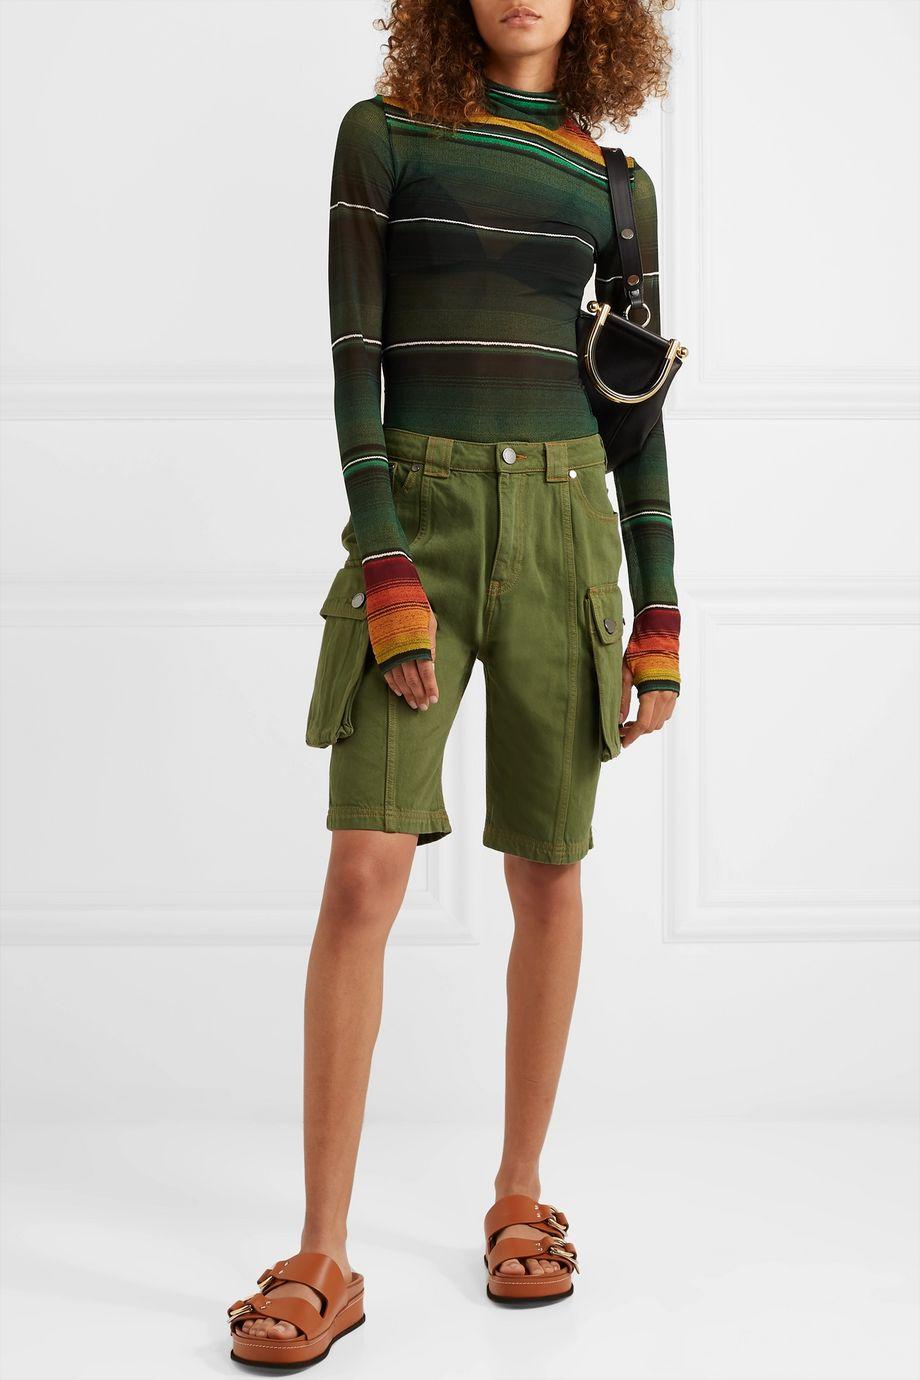 House of Holland Denim cargo shorts